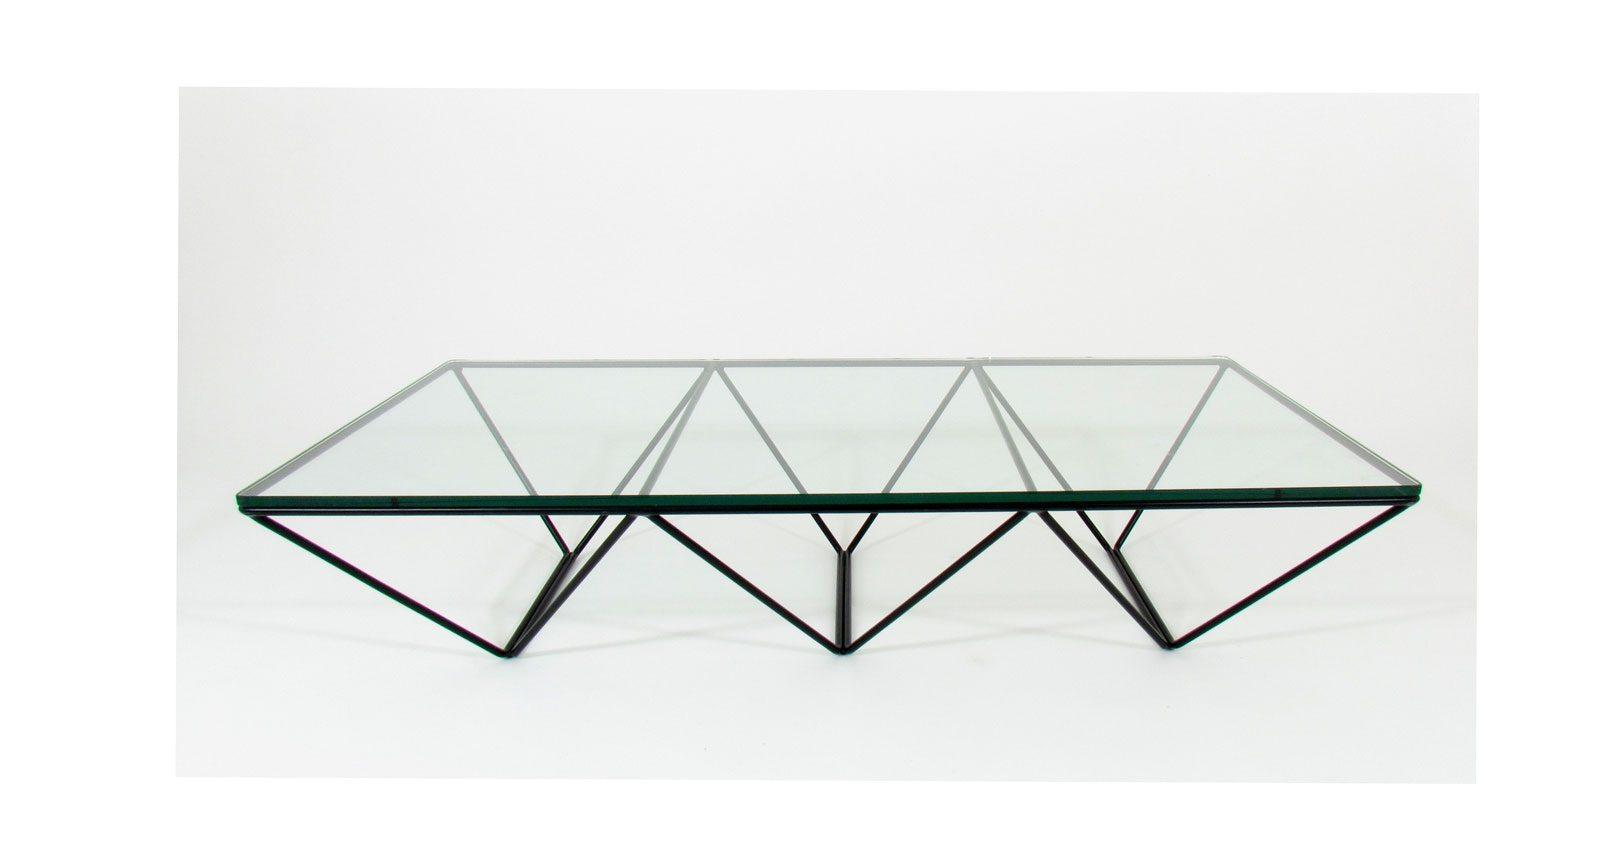 alanda paolo piva coffee table tavolo metal crystal cristallo metallo telaio